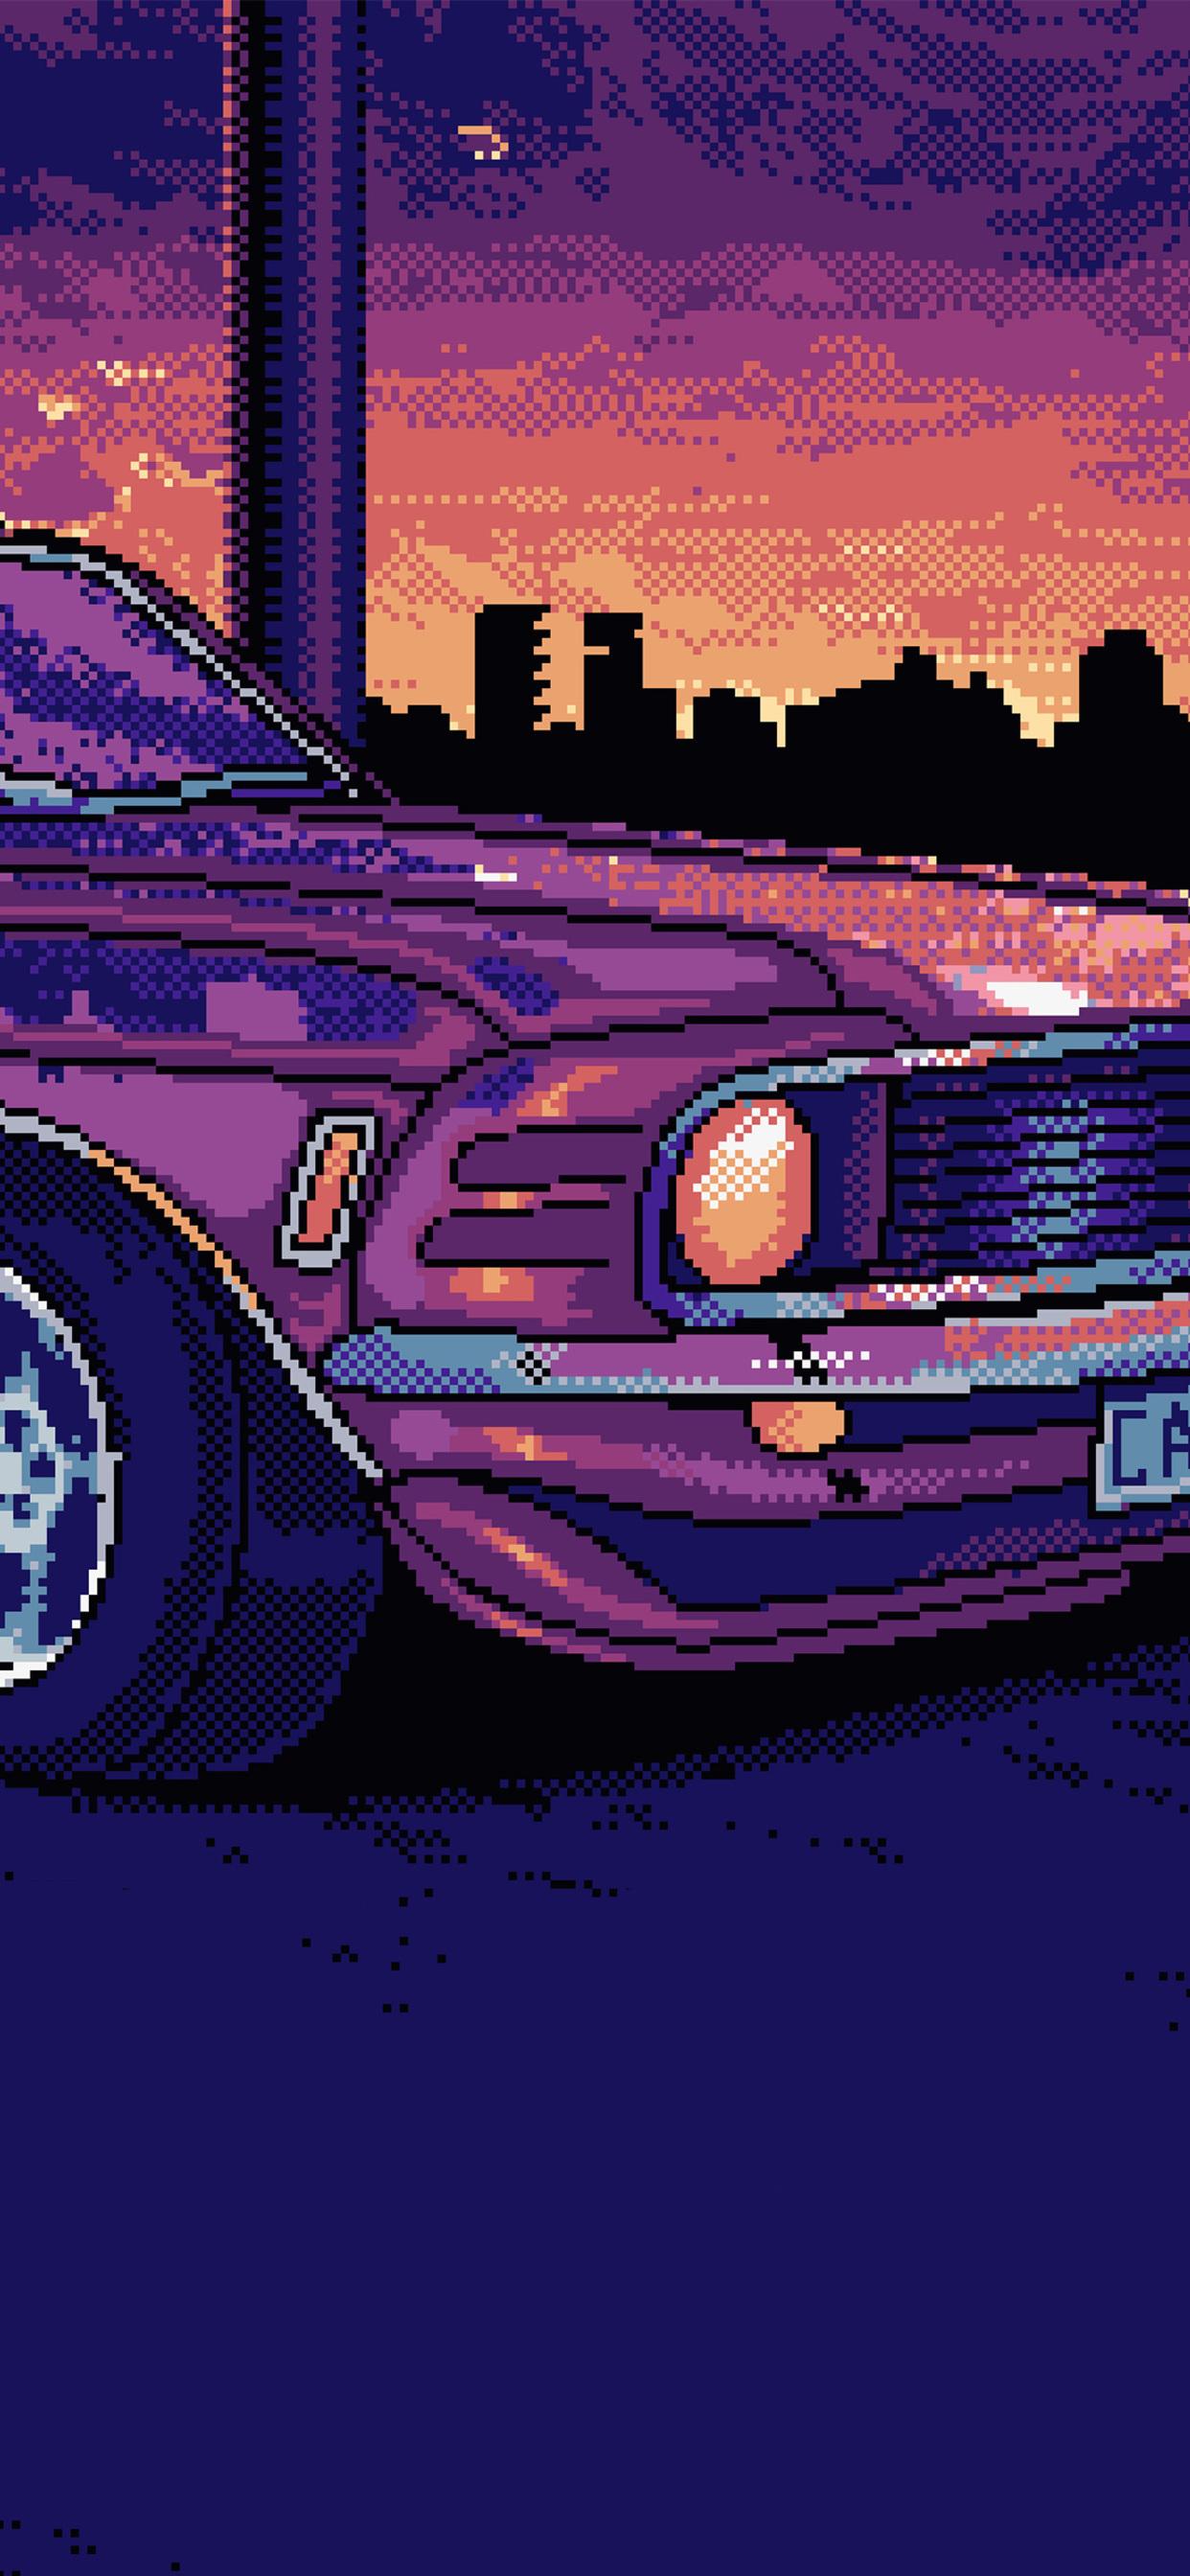 8 Bit Mustang Iphone Xs Max Hd 4k Wallpapers Images Car